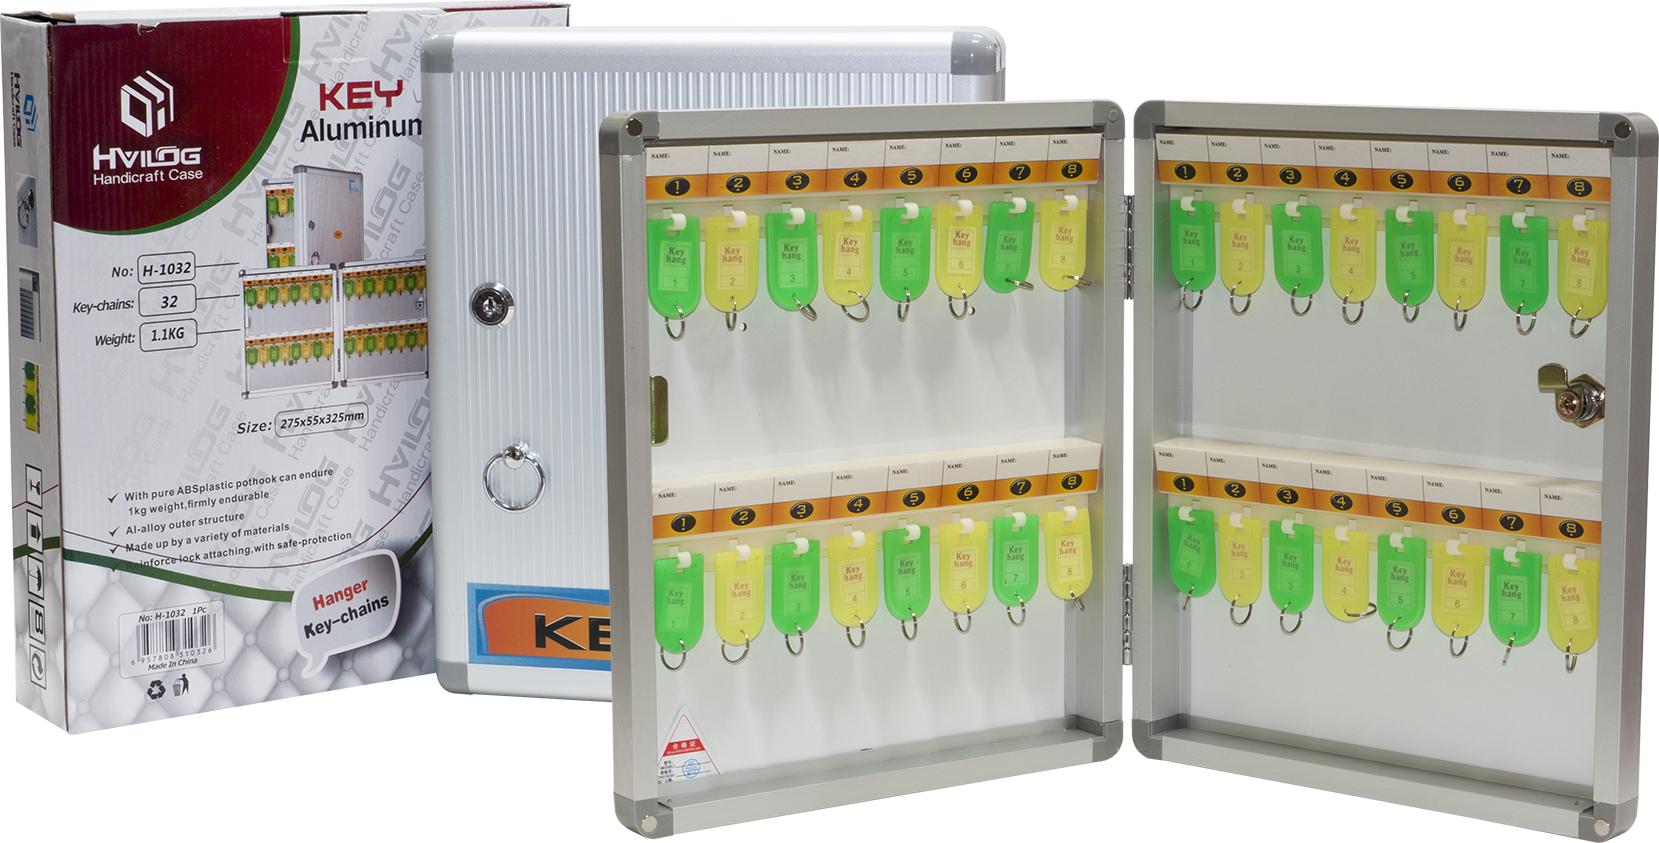 H-1032 Key Case